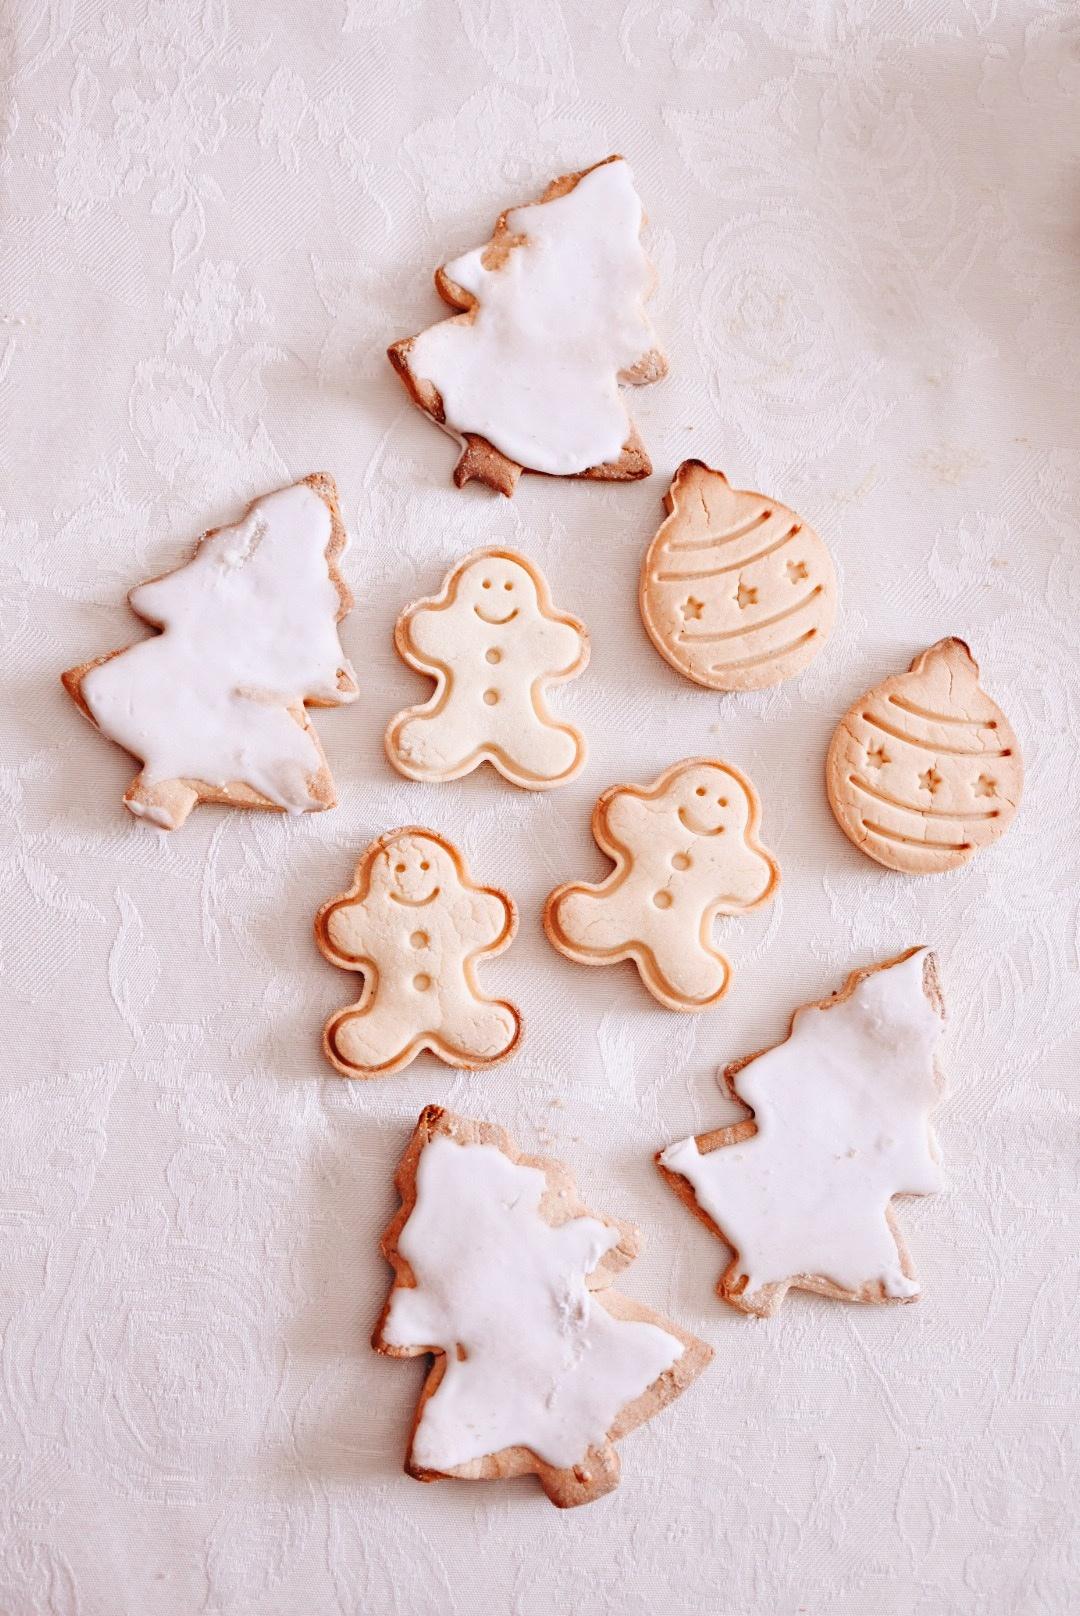 biscotti panna e miele